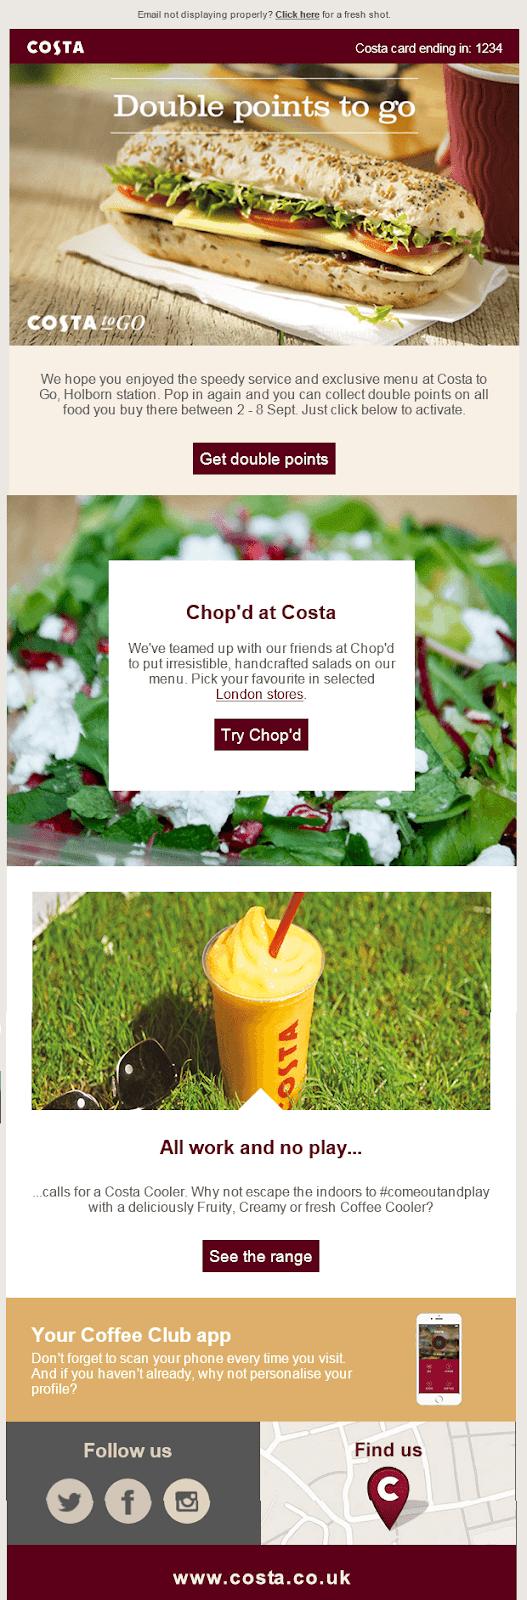 email regarding the coupon code